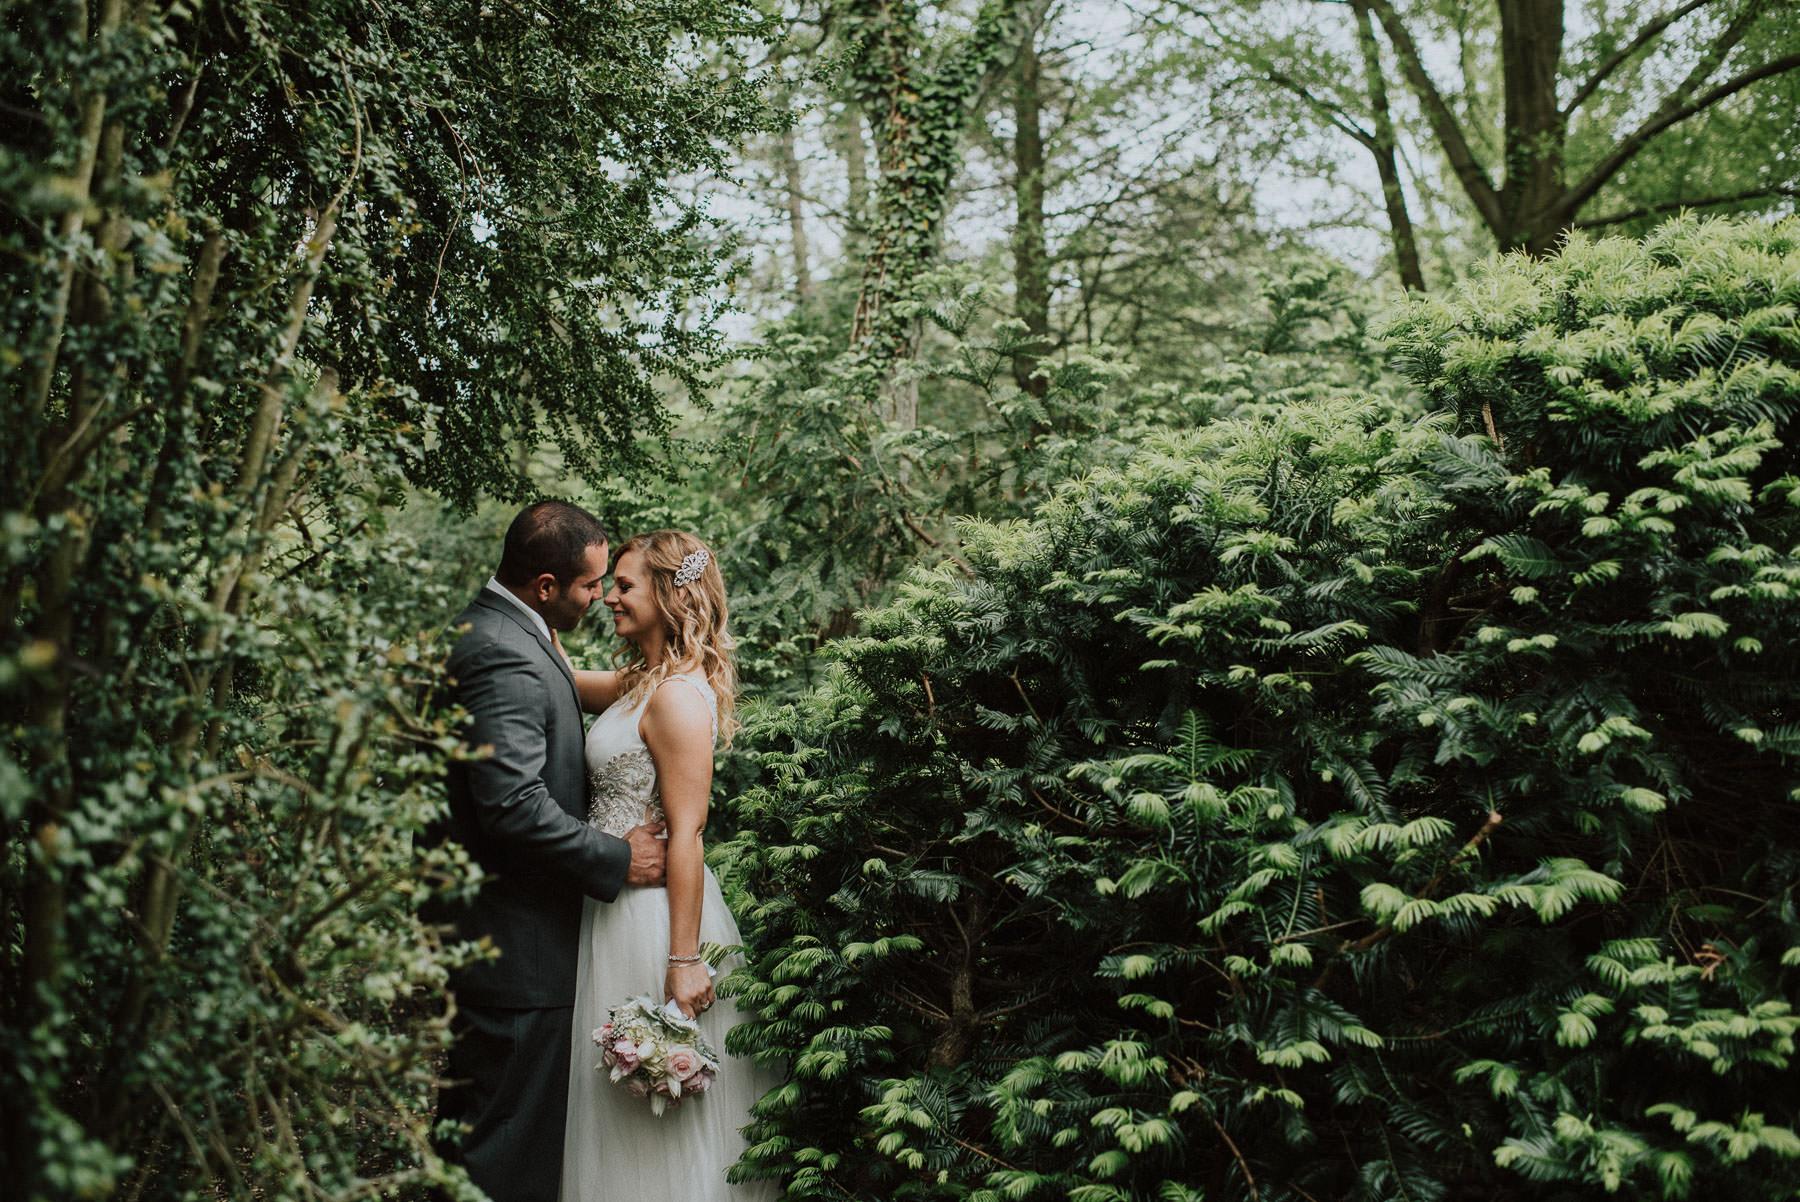 appleford-estate-wedding-photography-37.jpg